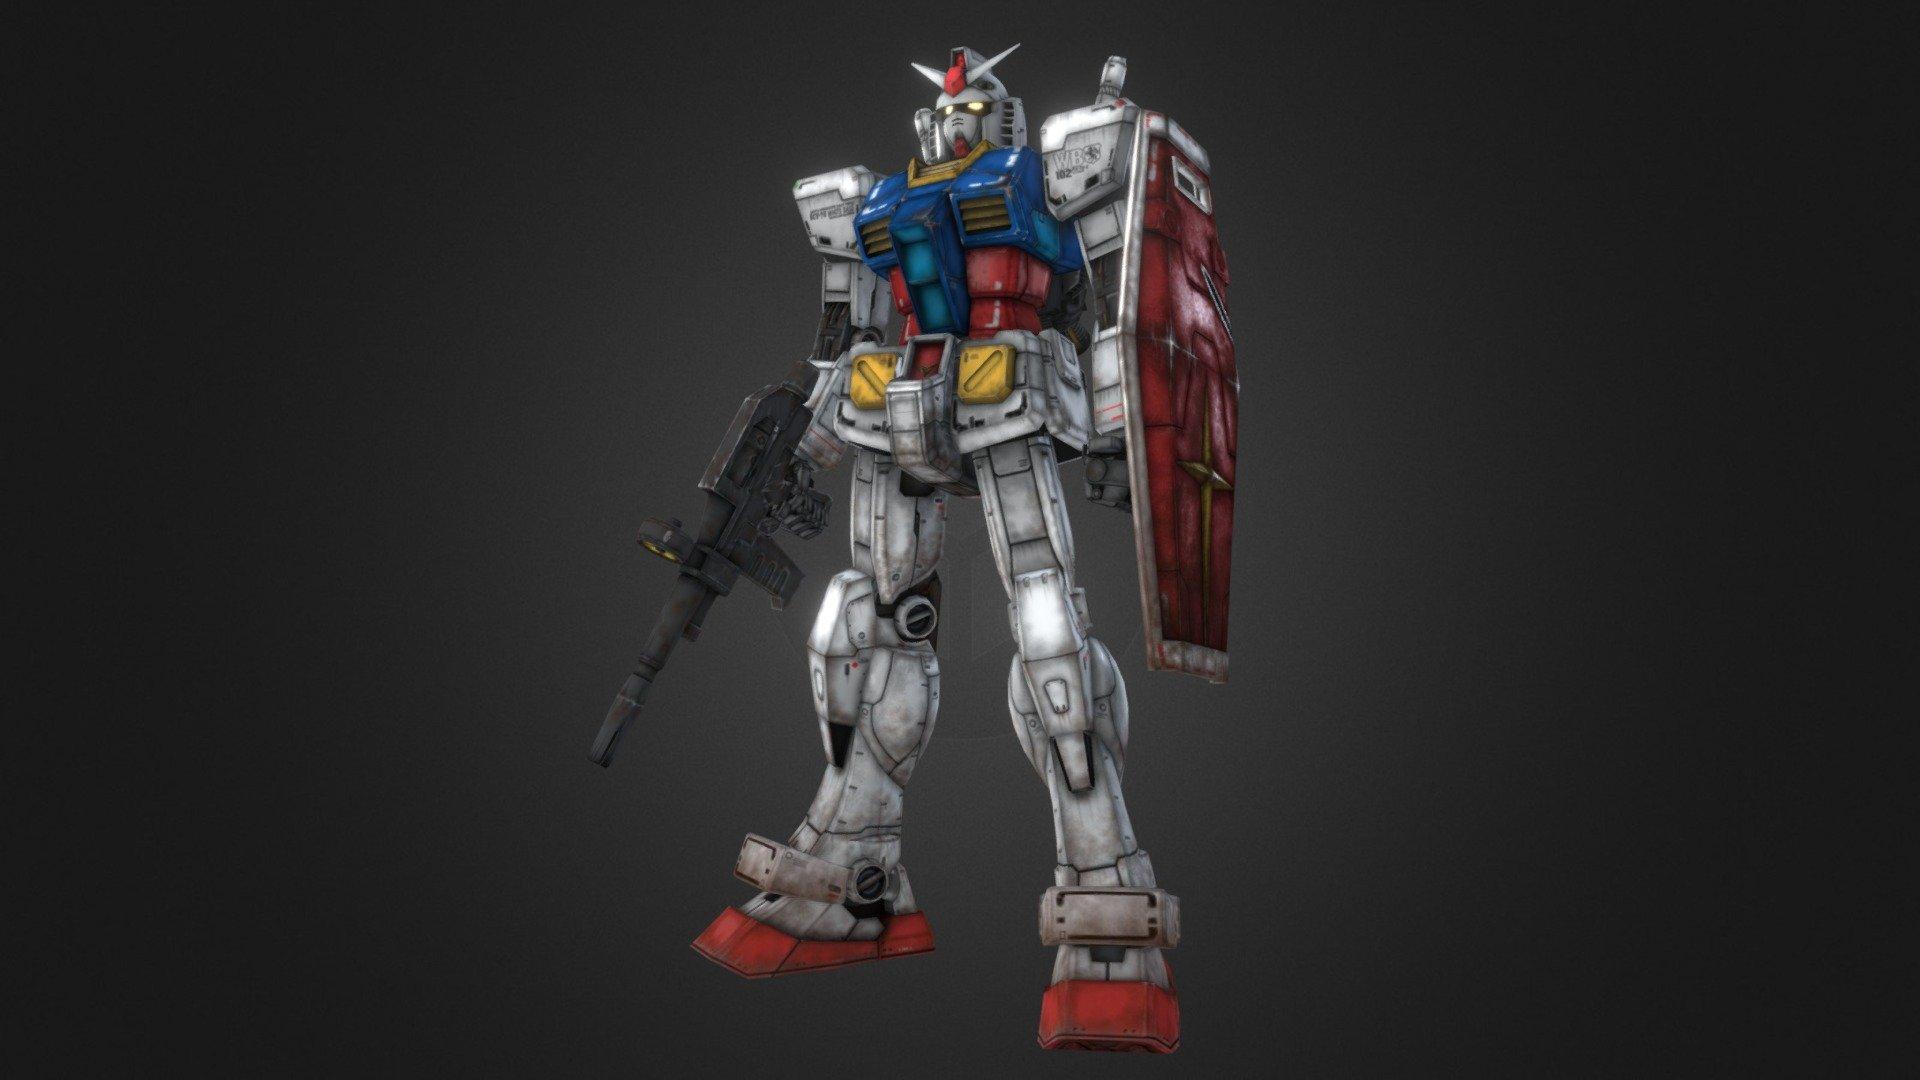 Gundam Rx 78 2 3d Model By Vito Bellomo Raiza88 2e11b20